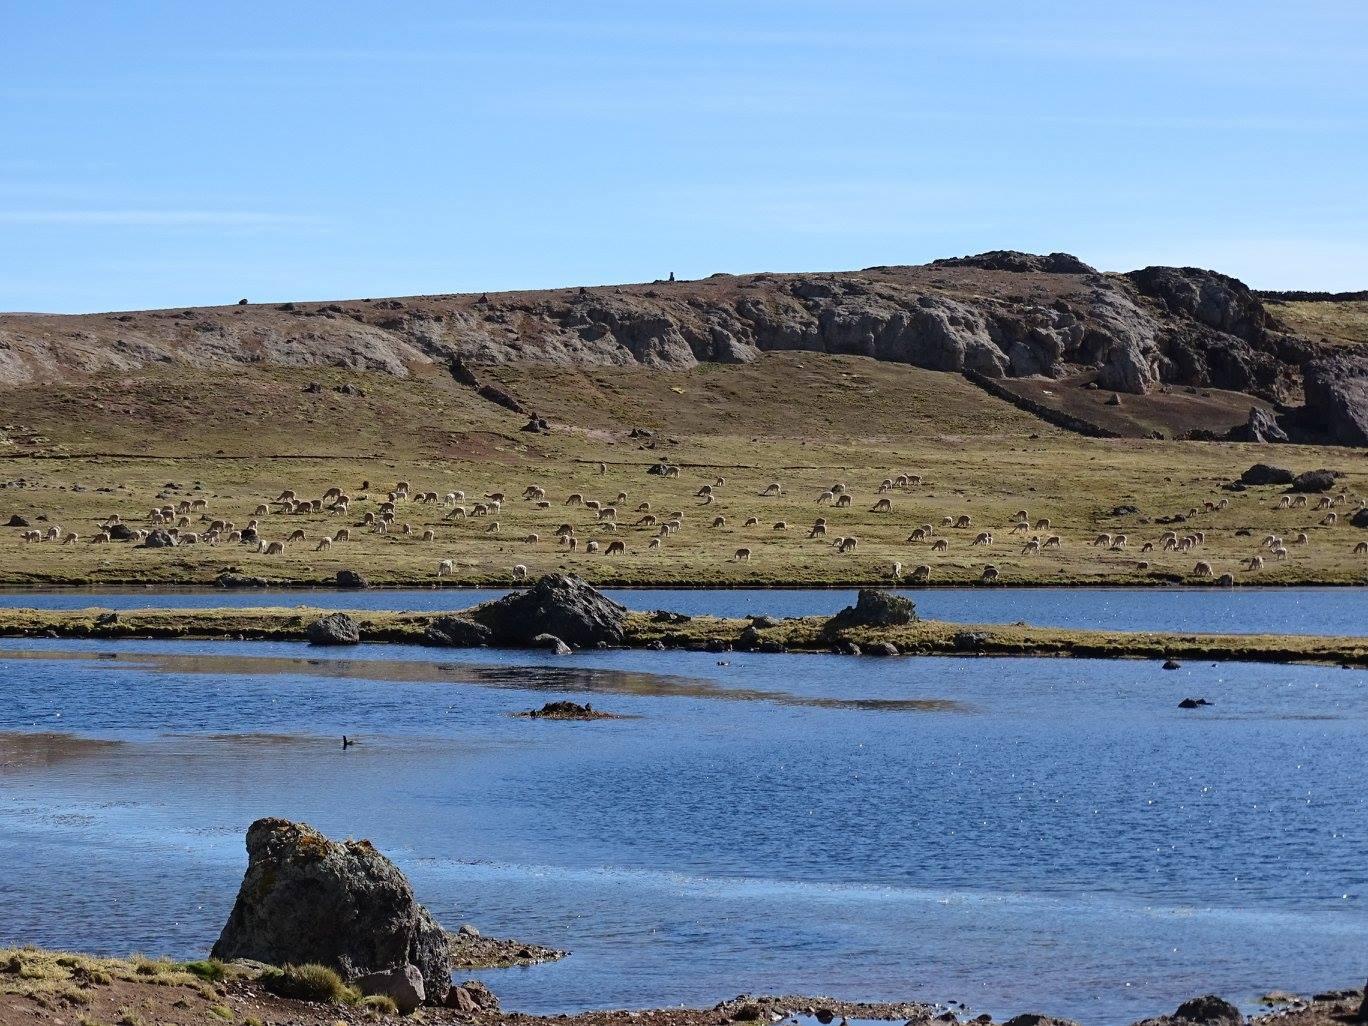 Laguna de Choclococha (Sta Ines)